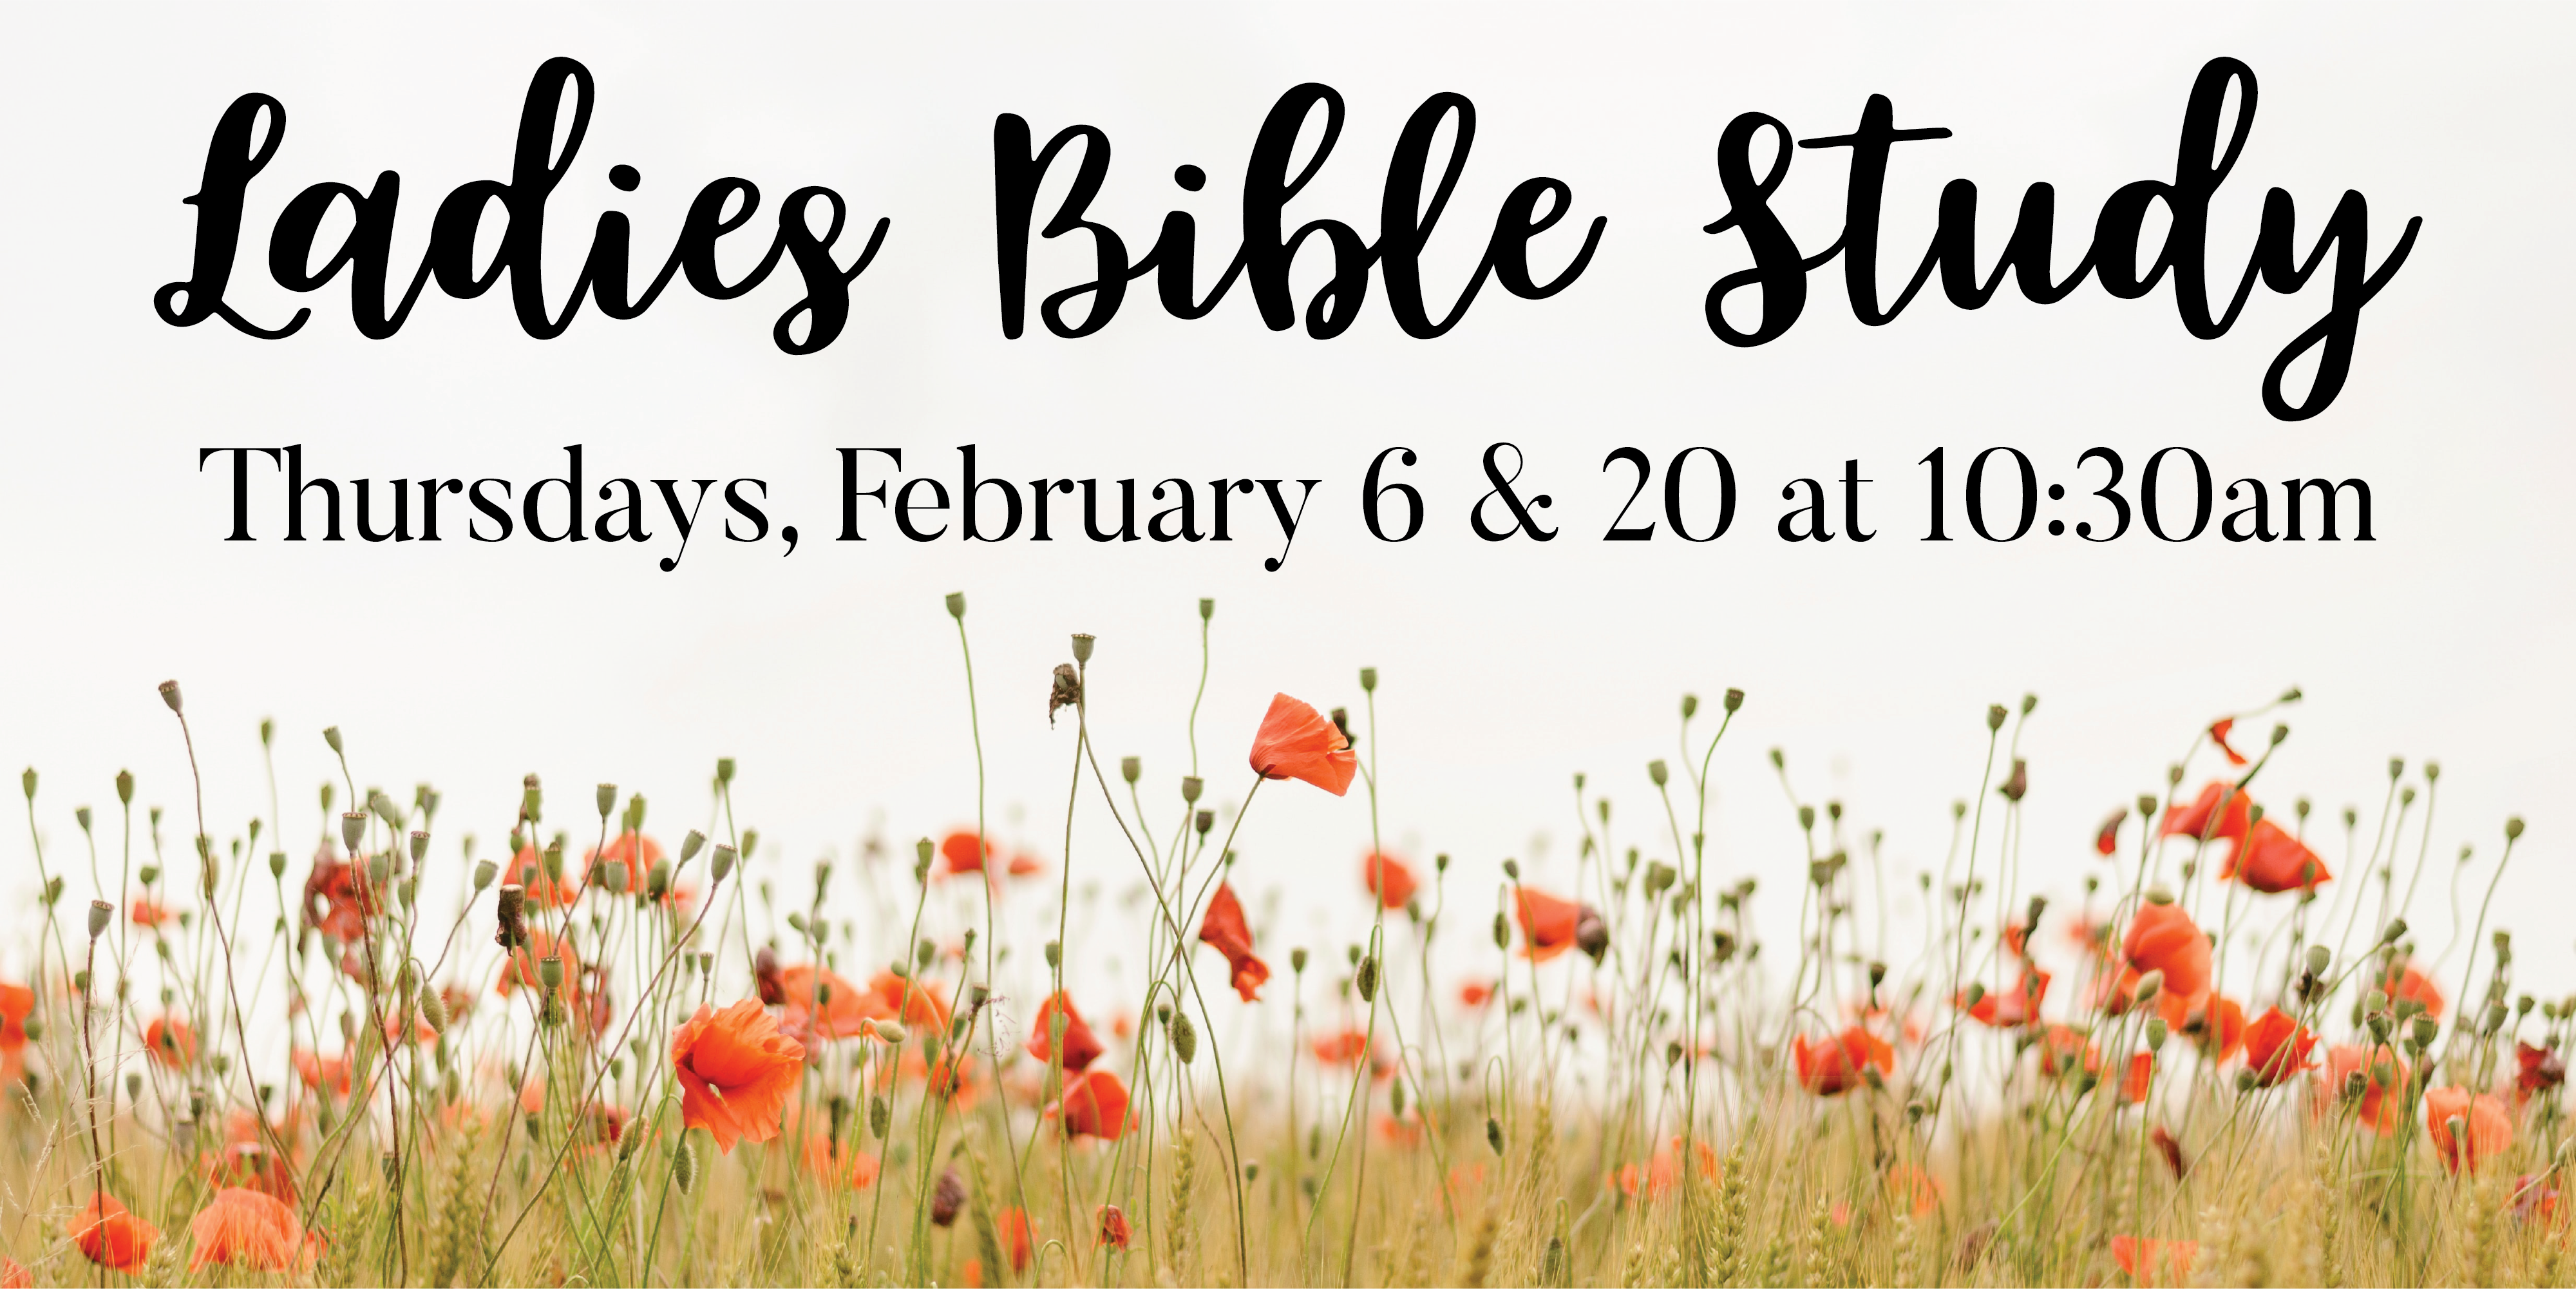 Highlands Presbyterian Church Grayson Georgia Womens Bible Study